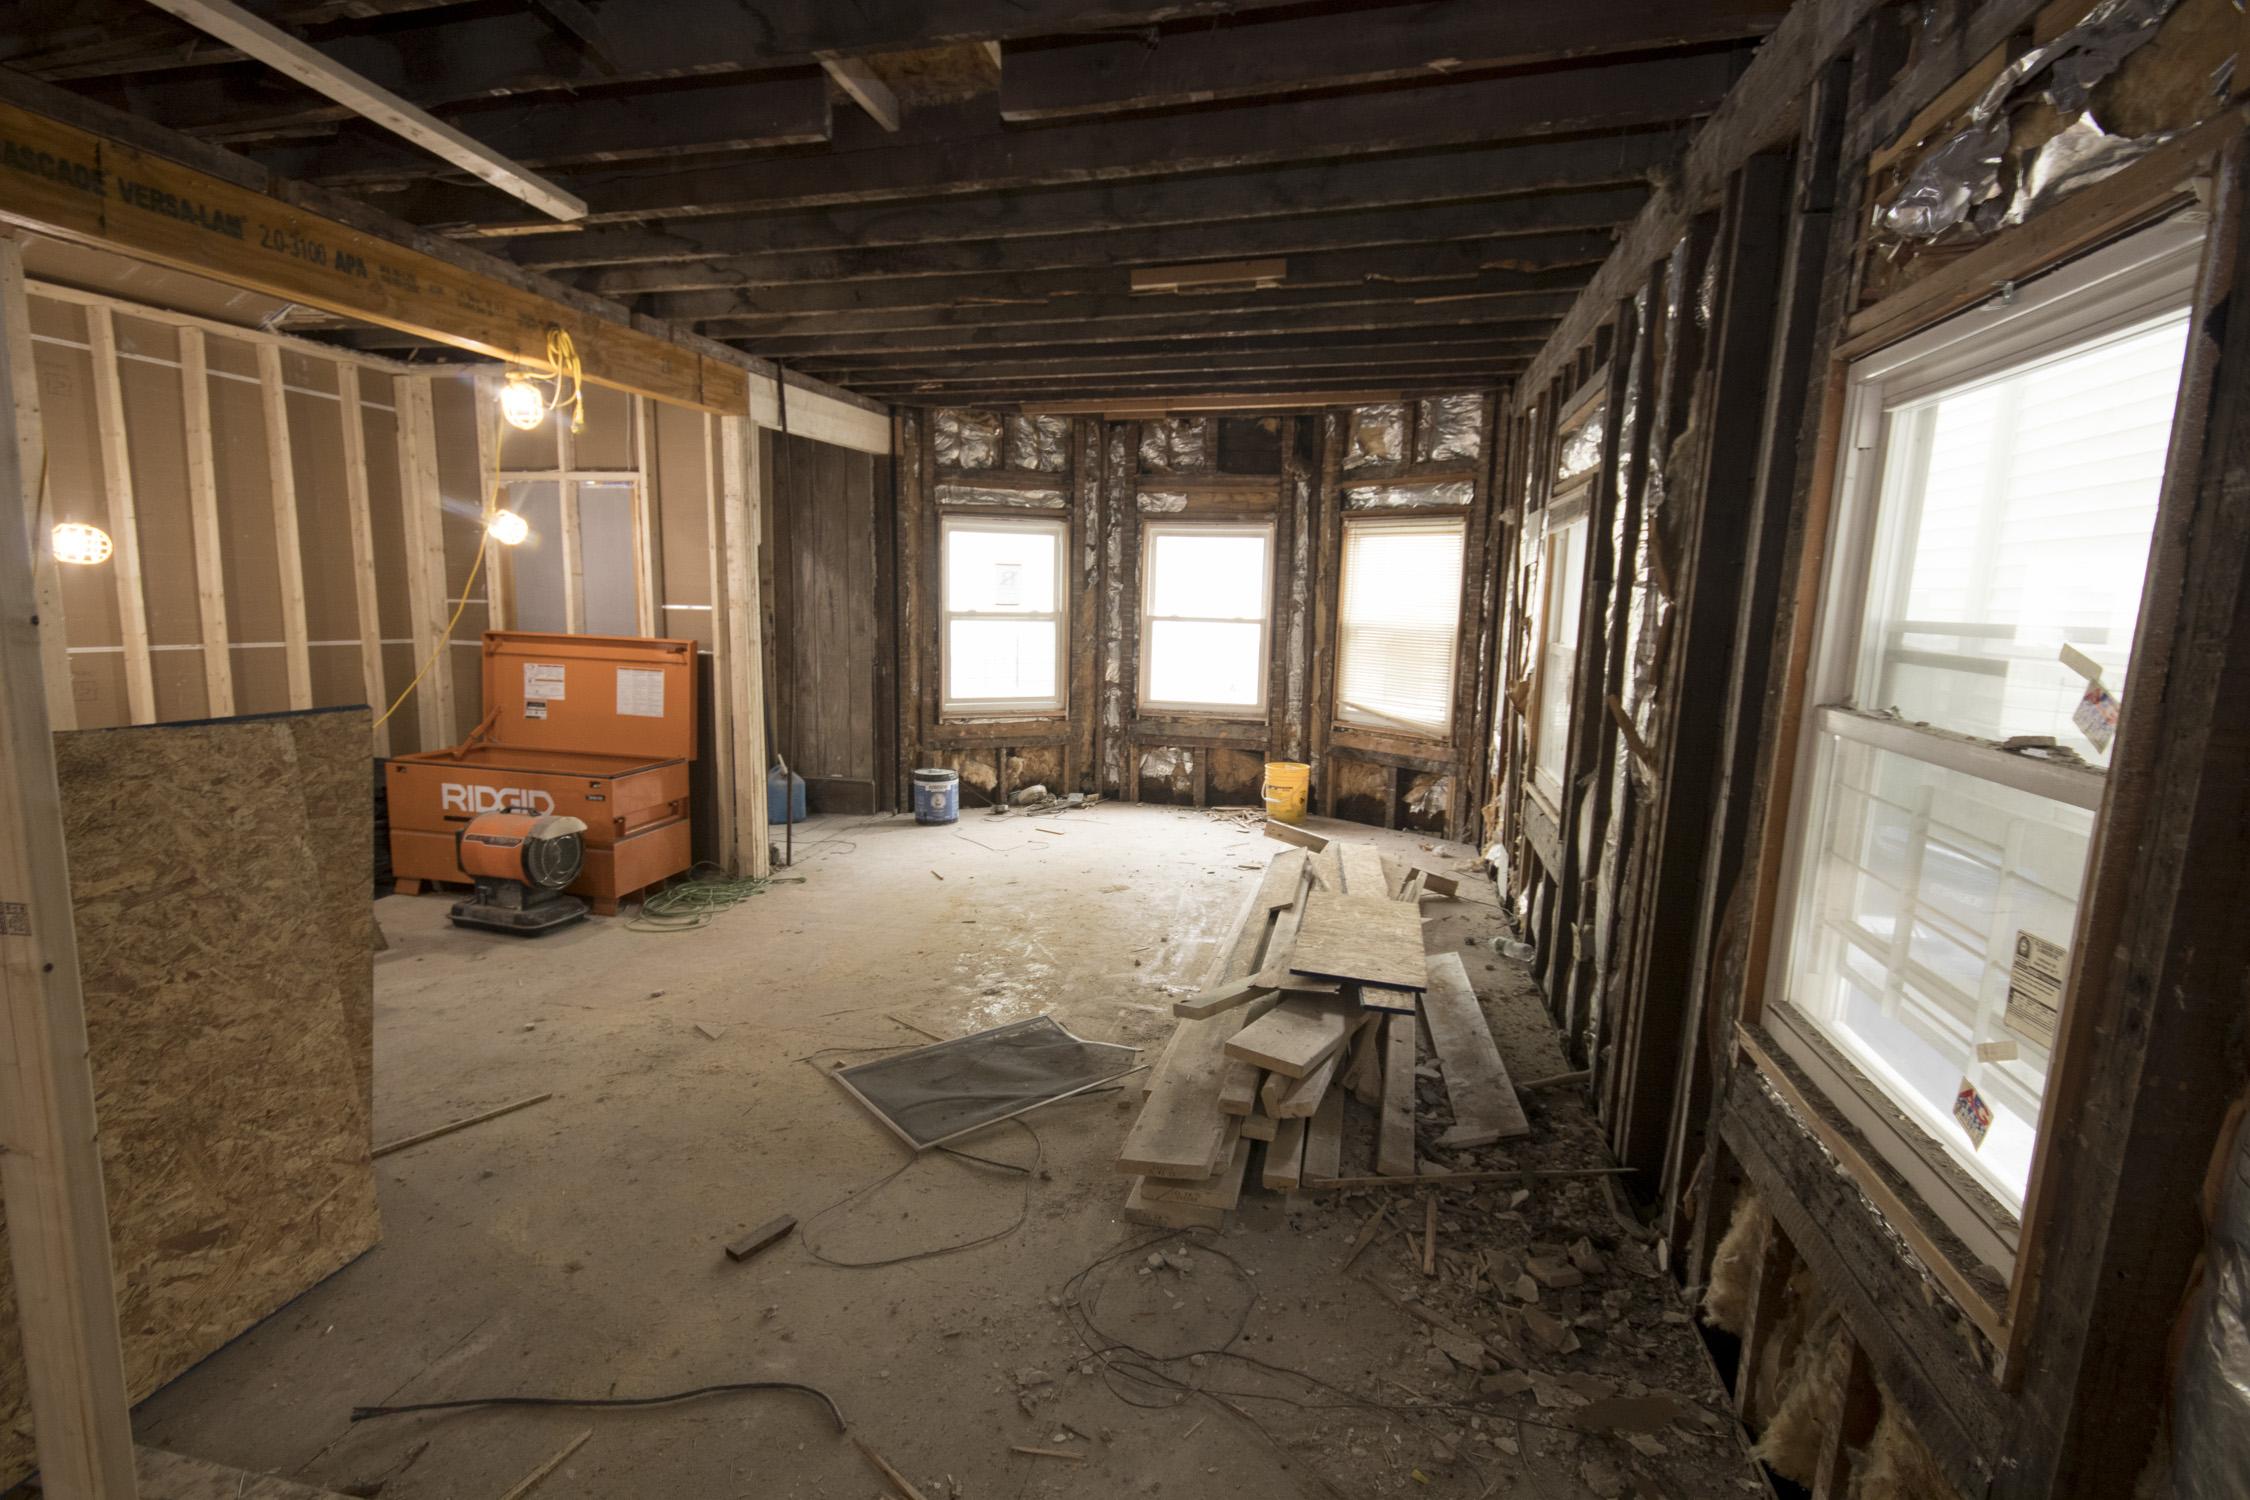 25 Darling St Boston General Contractors P Northeast Contractors_65